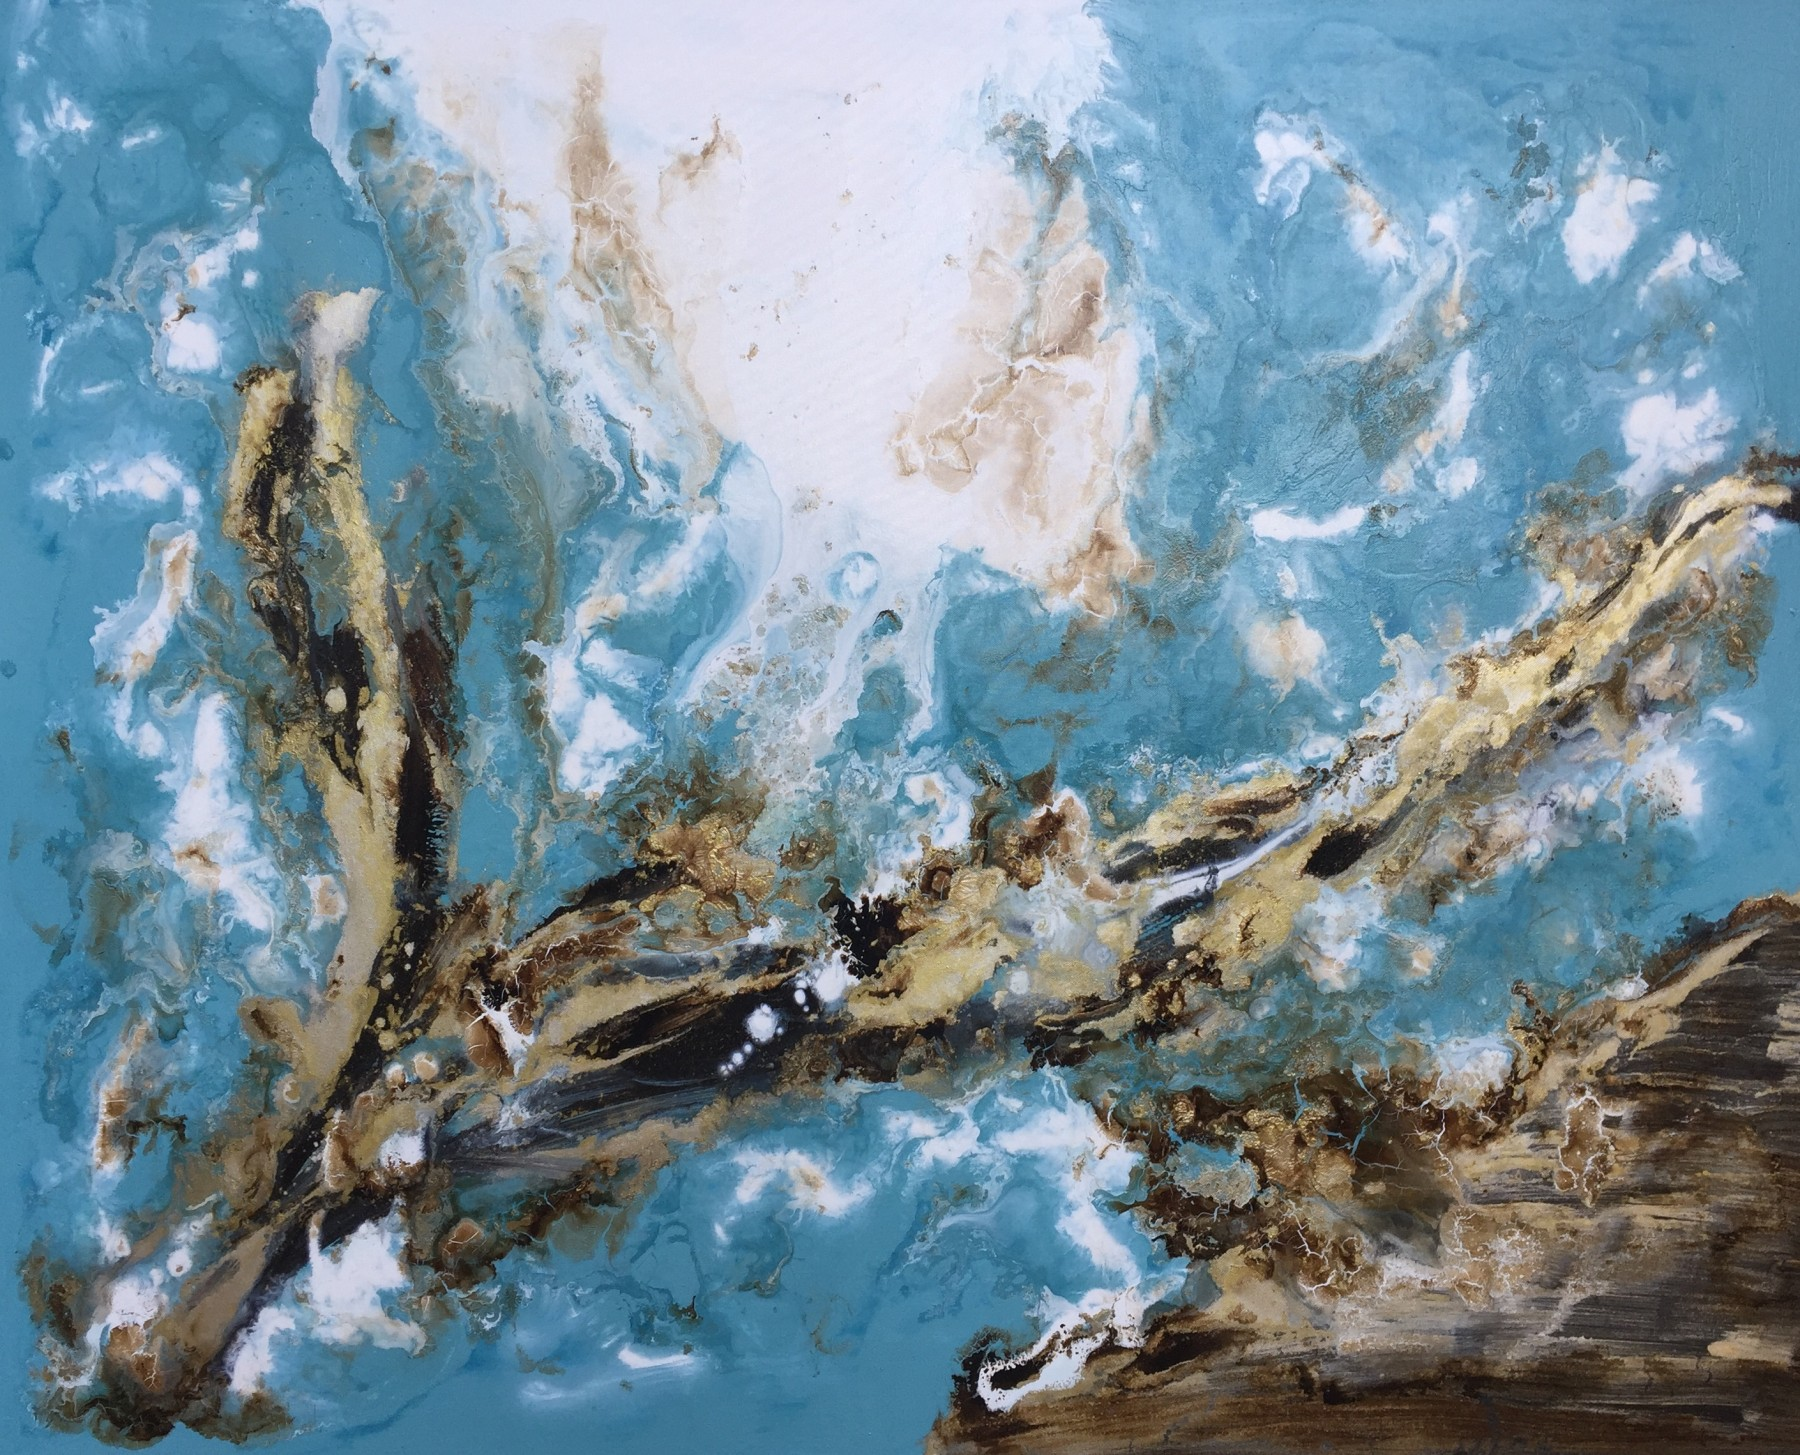 Burton-Kevin-Ocean-Depths